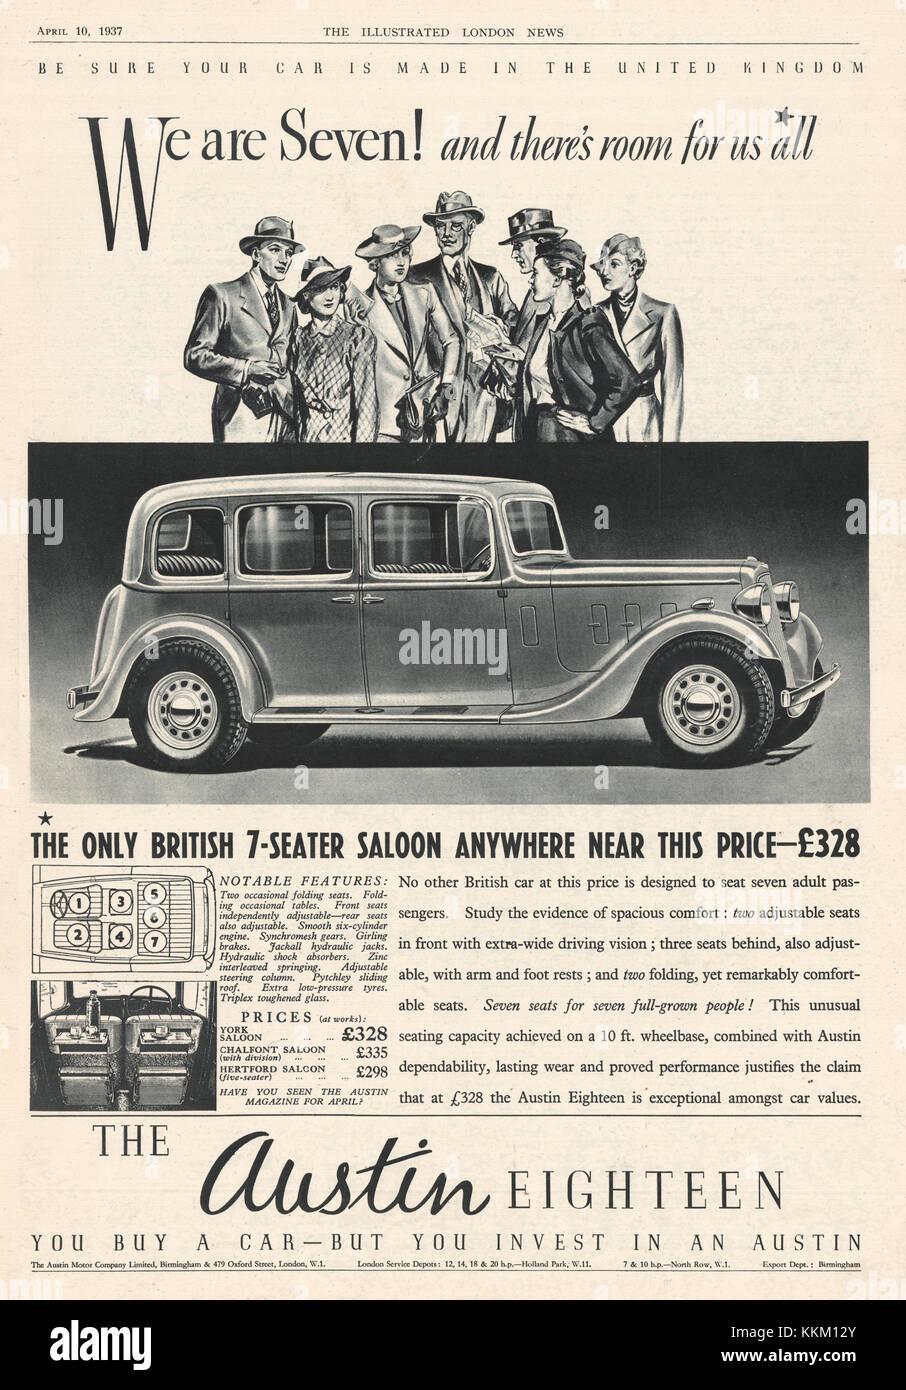 1937 UK Magazine Austin Eighteen Car Advert - Stock Image